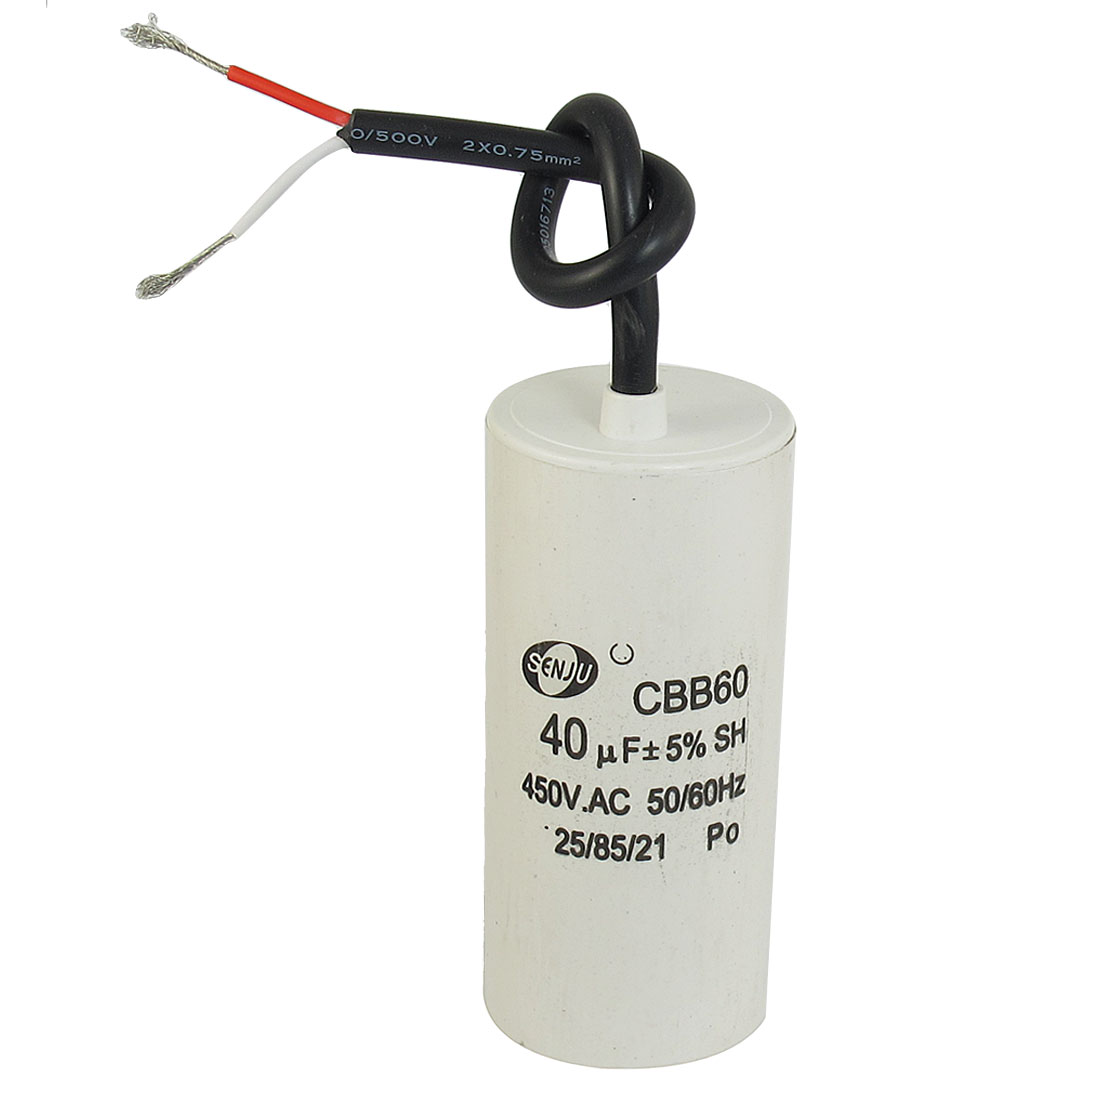 CBB60 AC 450V 40uF Cylindrical Non Polar Motor Capacitor